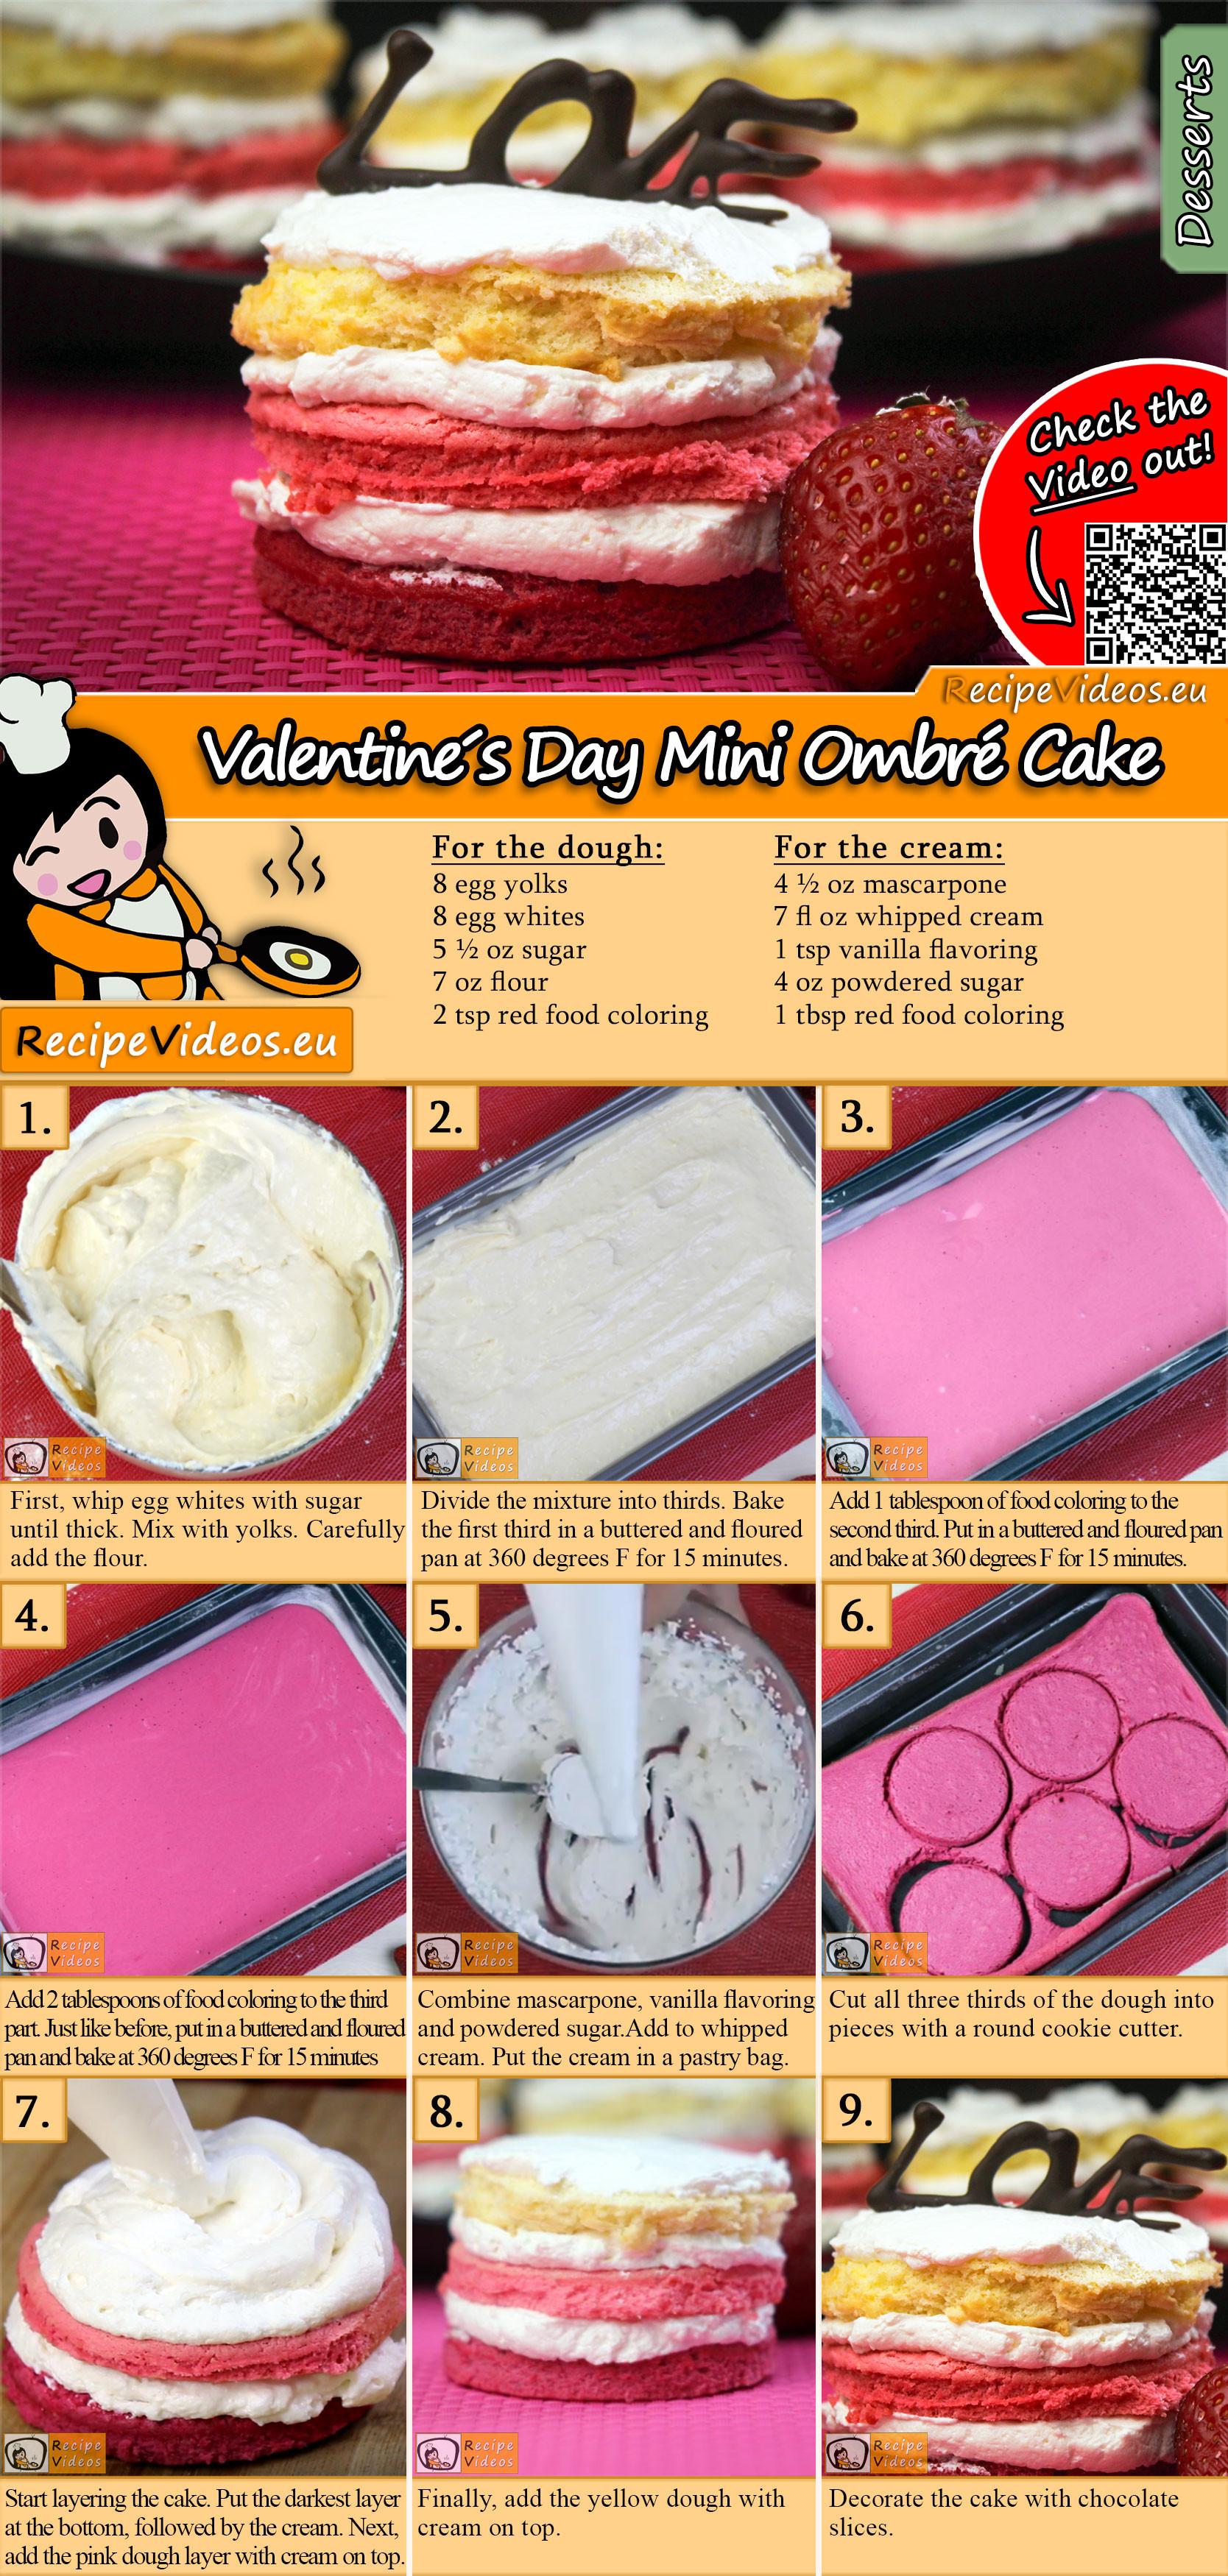 Valentine´s Day Mini Ombré Cake recipe with video